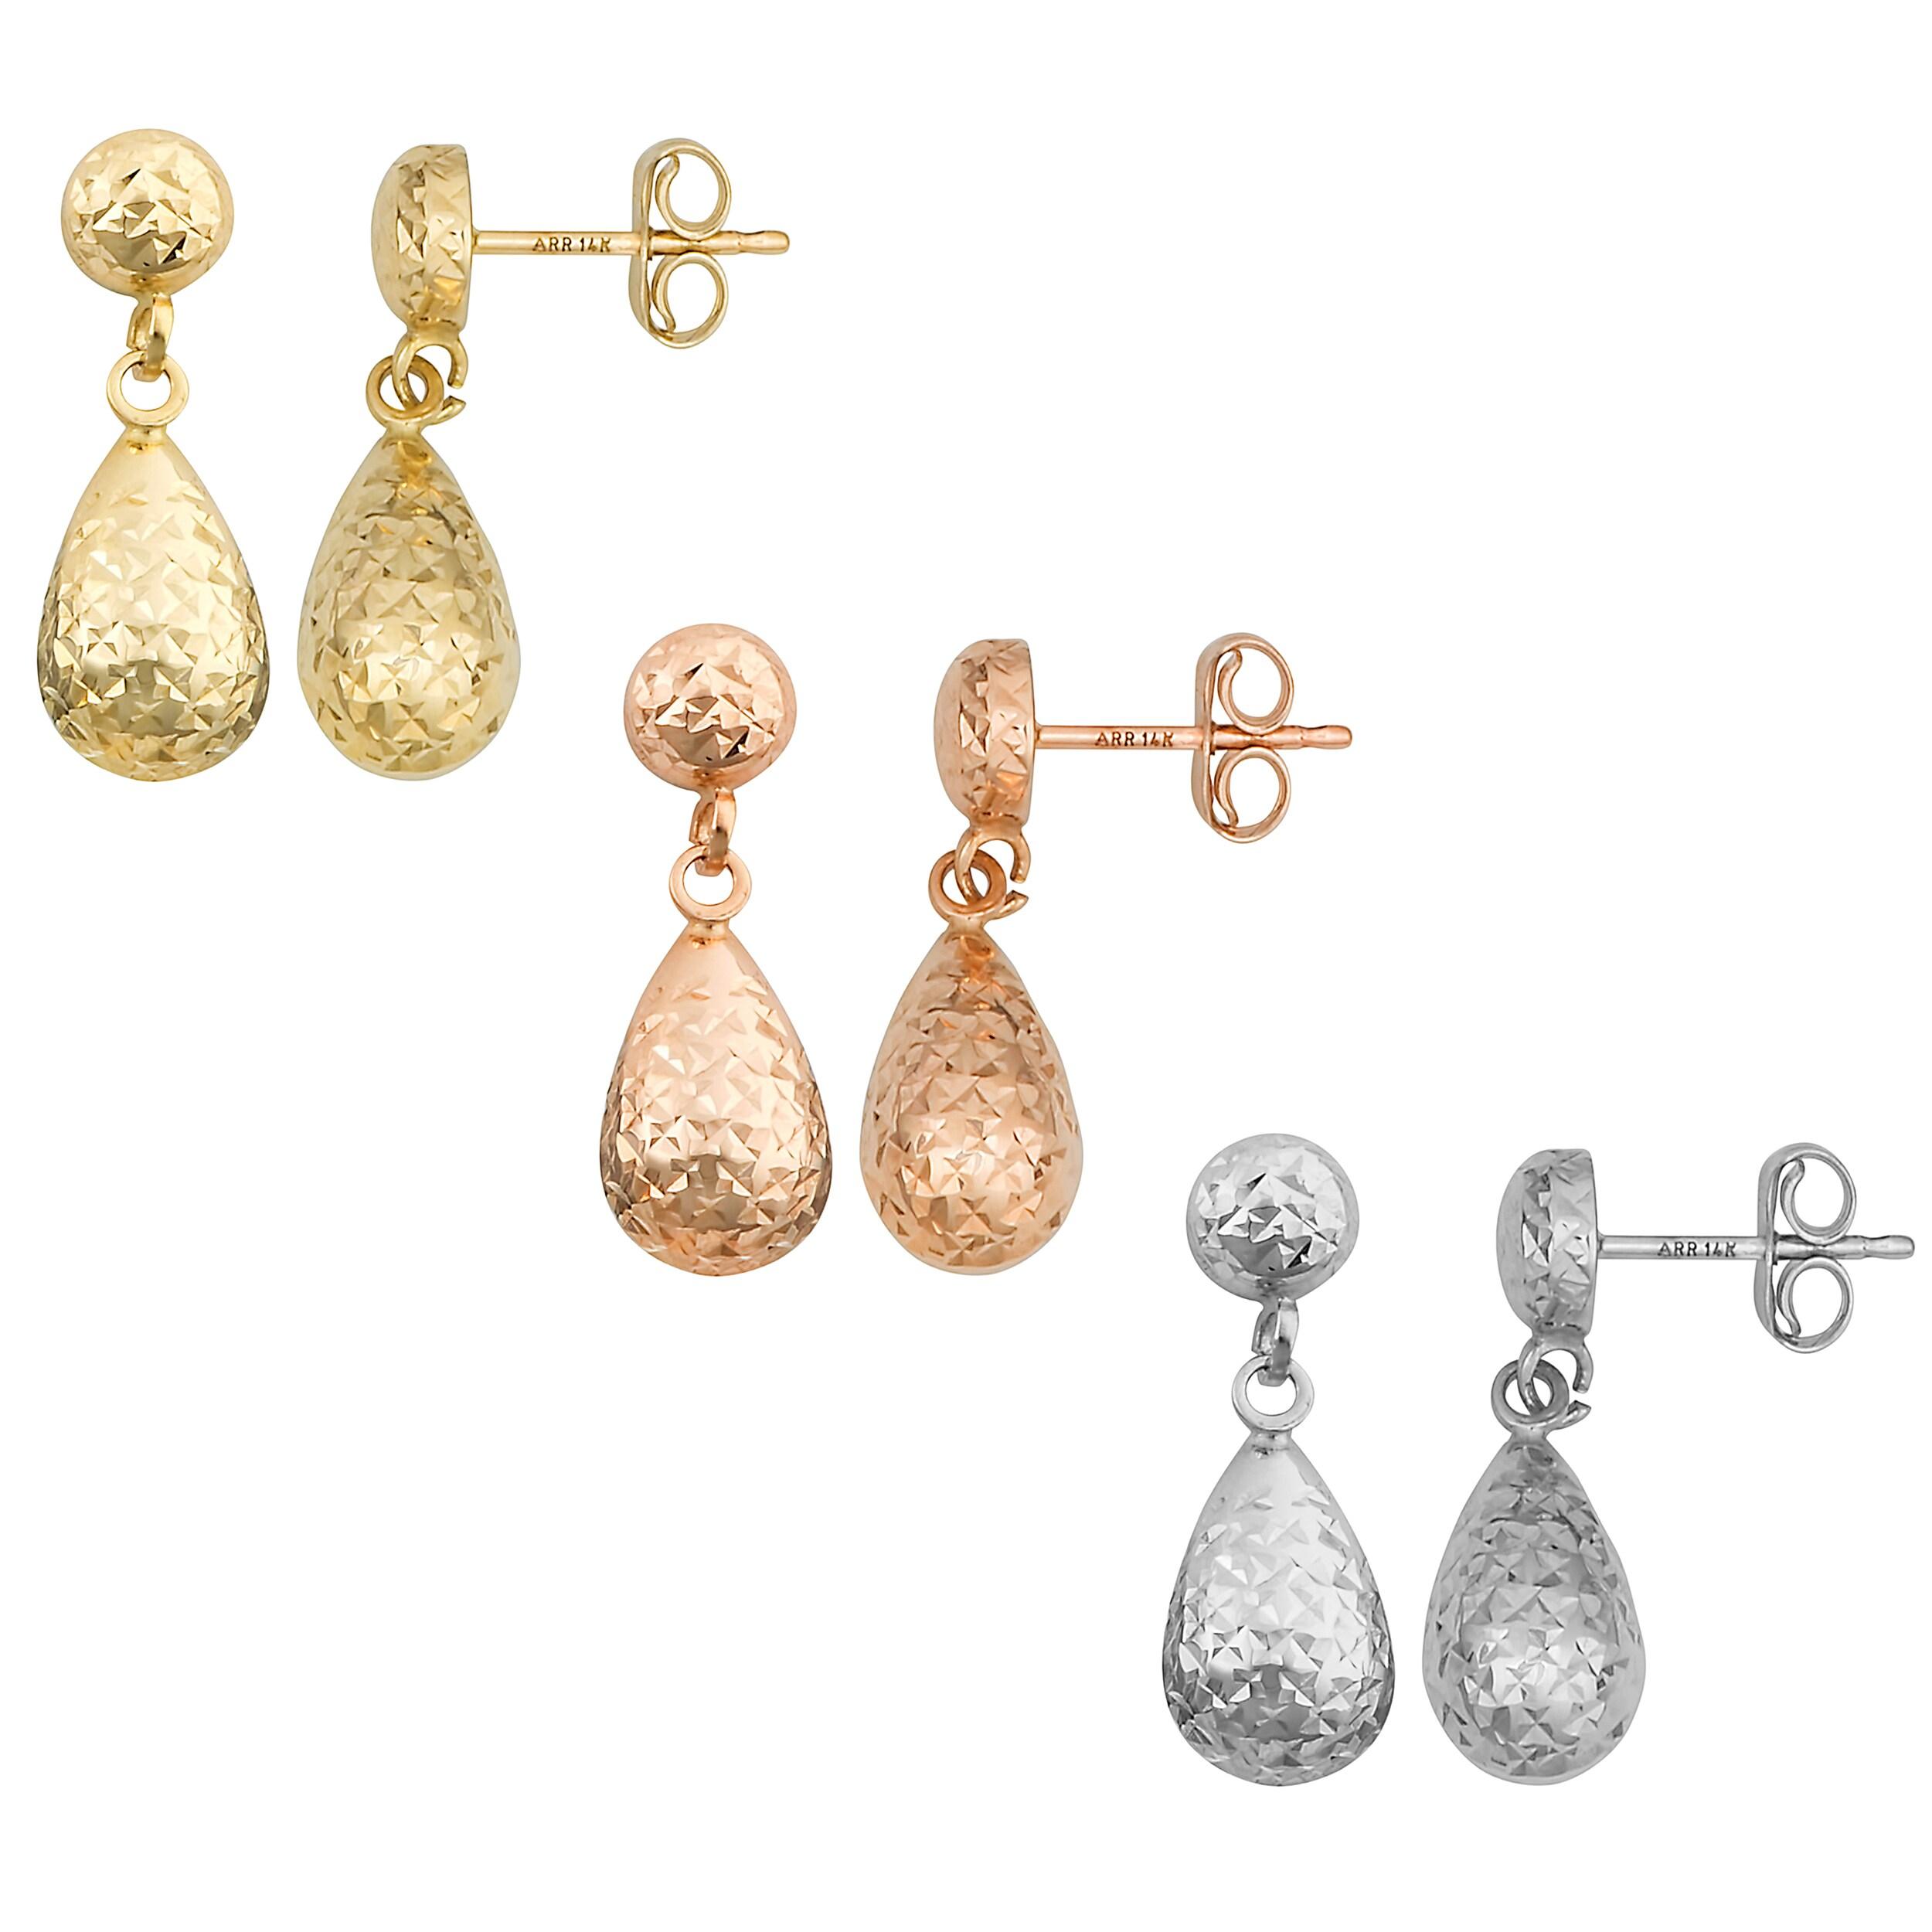 Fremada 10k Gold Diamond-cut Petite Teardrop Dangle Earrings at Sears.com